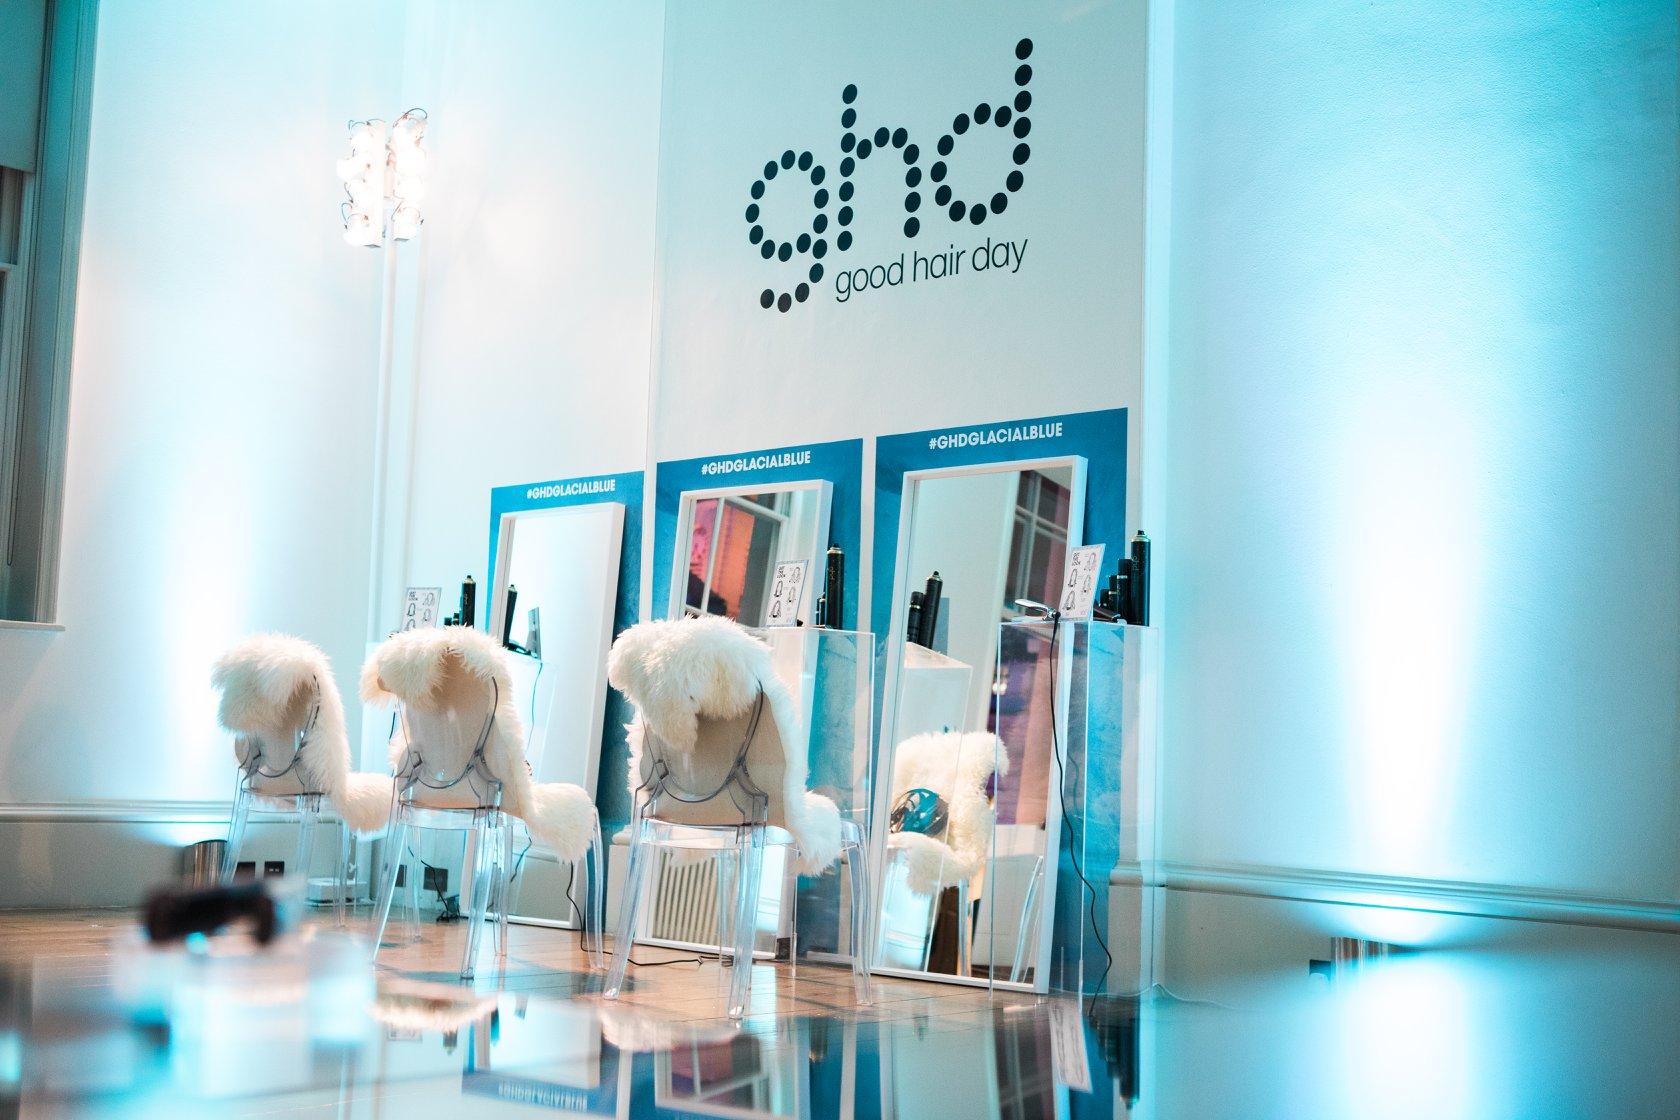 ghd London Glacial Collection